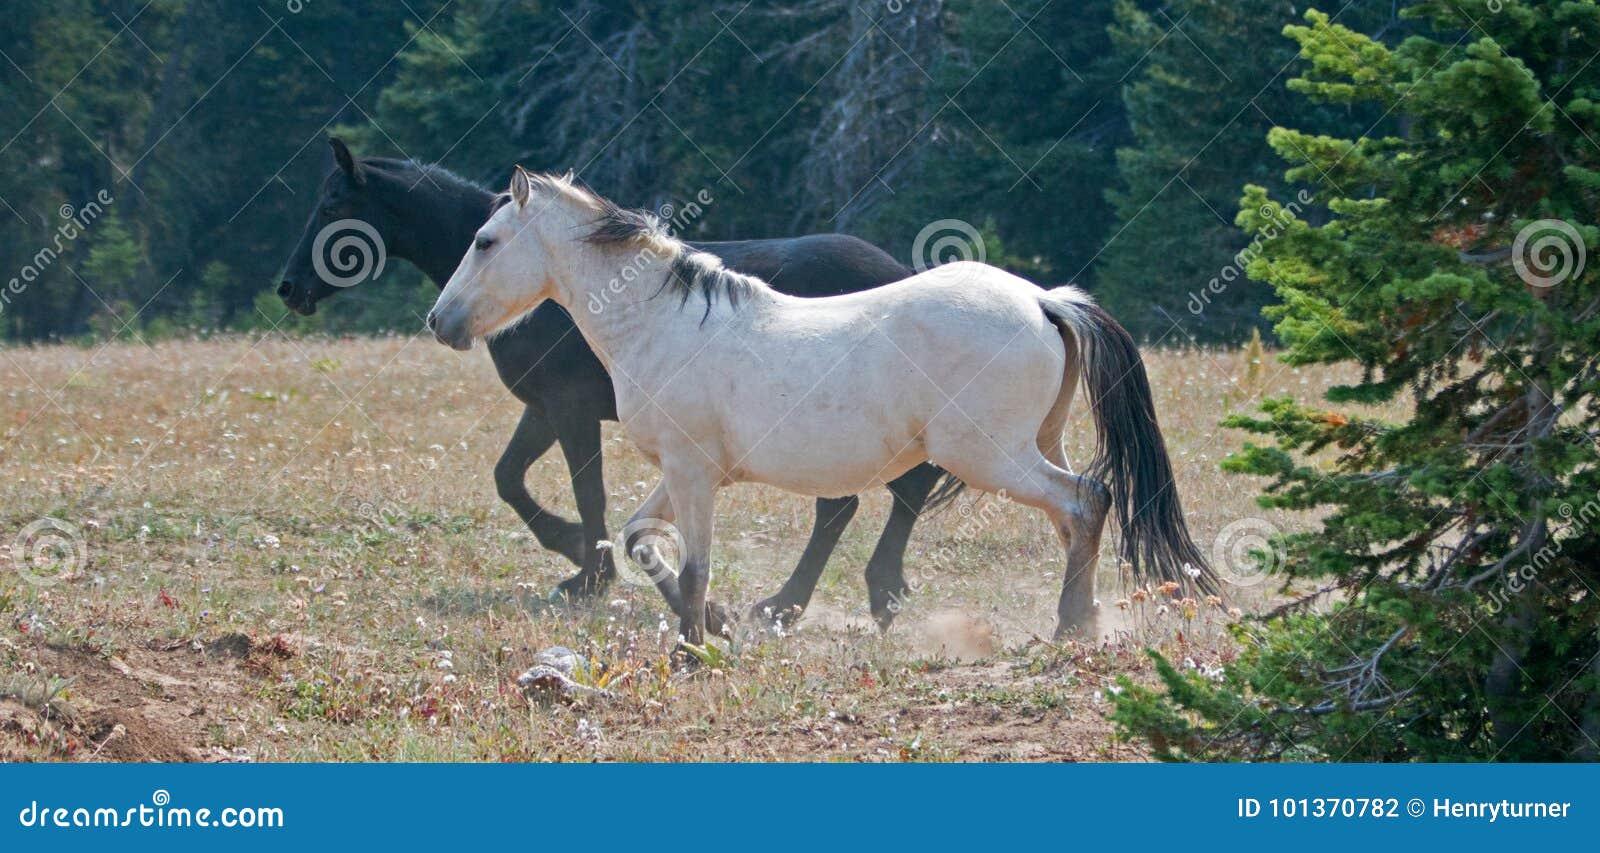 Apricot Dun White Buckskin Stallion And Black Stallion Wild Horses Running In The Pryor Mountains Wild Horse Range In Montana Usa Stock Photo Image Of Caballus Dust 101370782